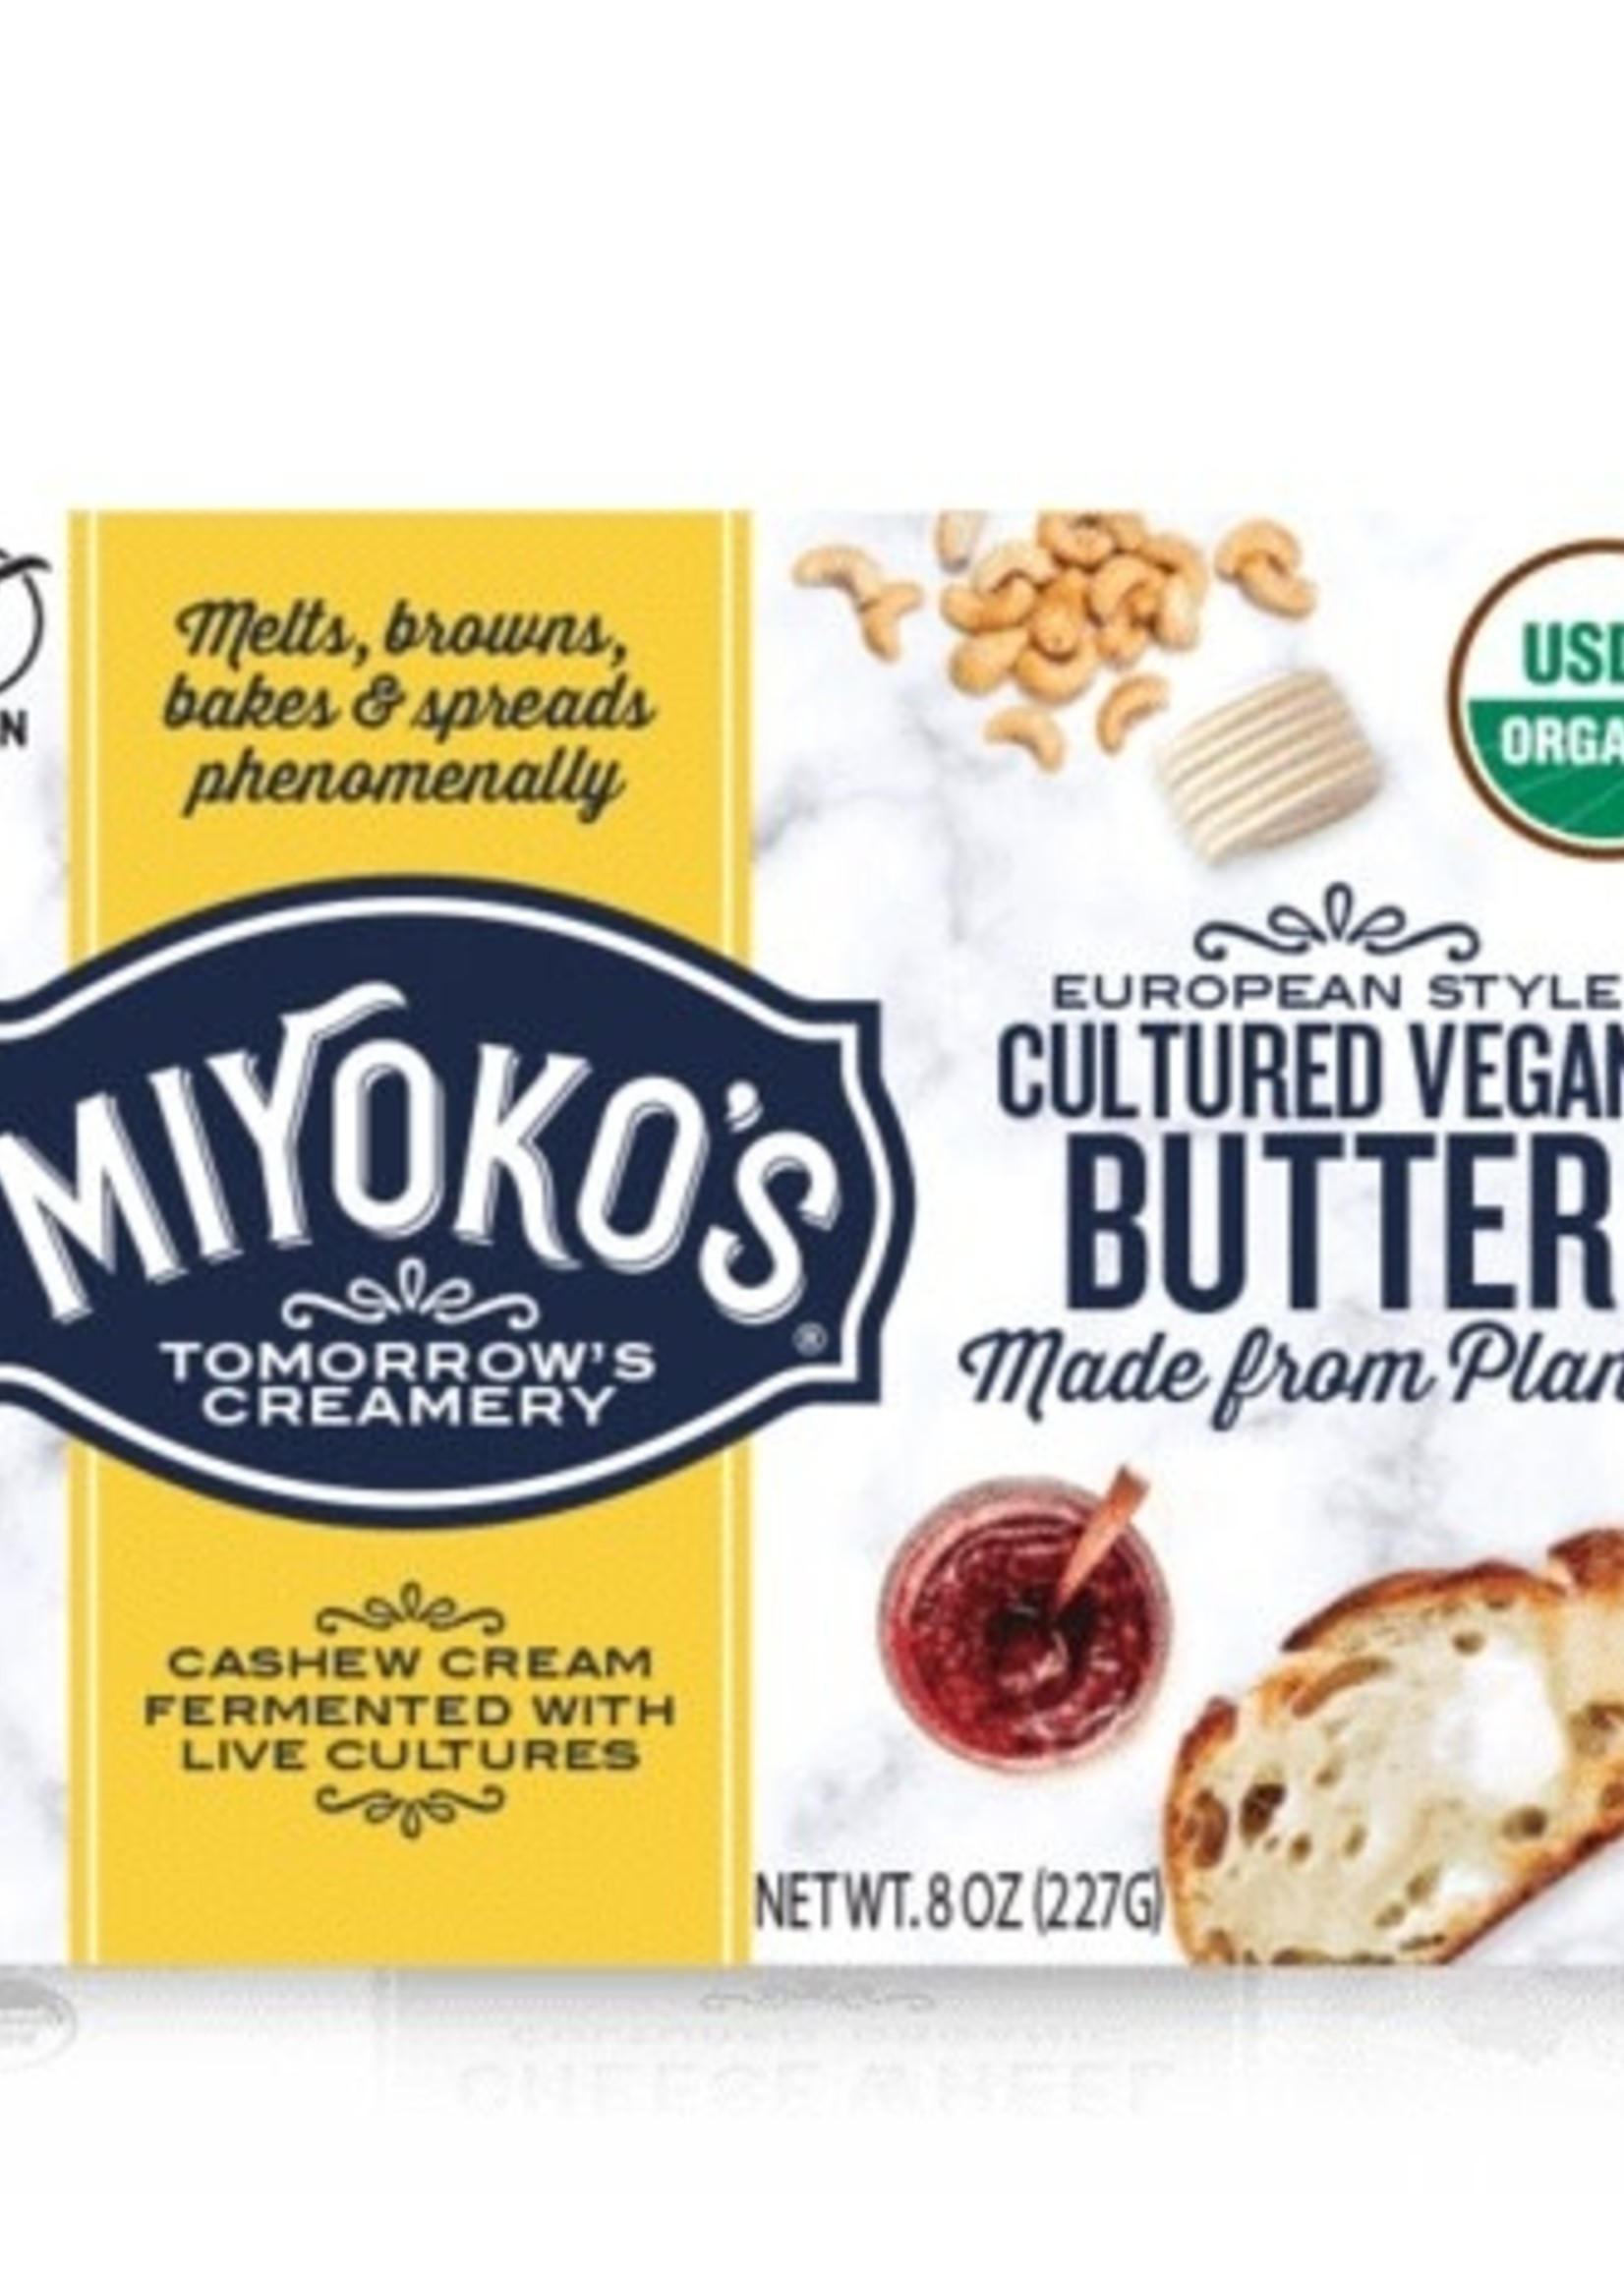 Miyoko Miyoko's vegan butter